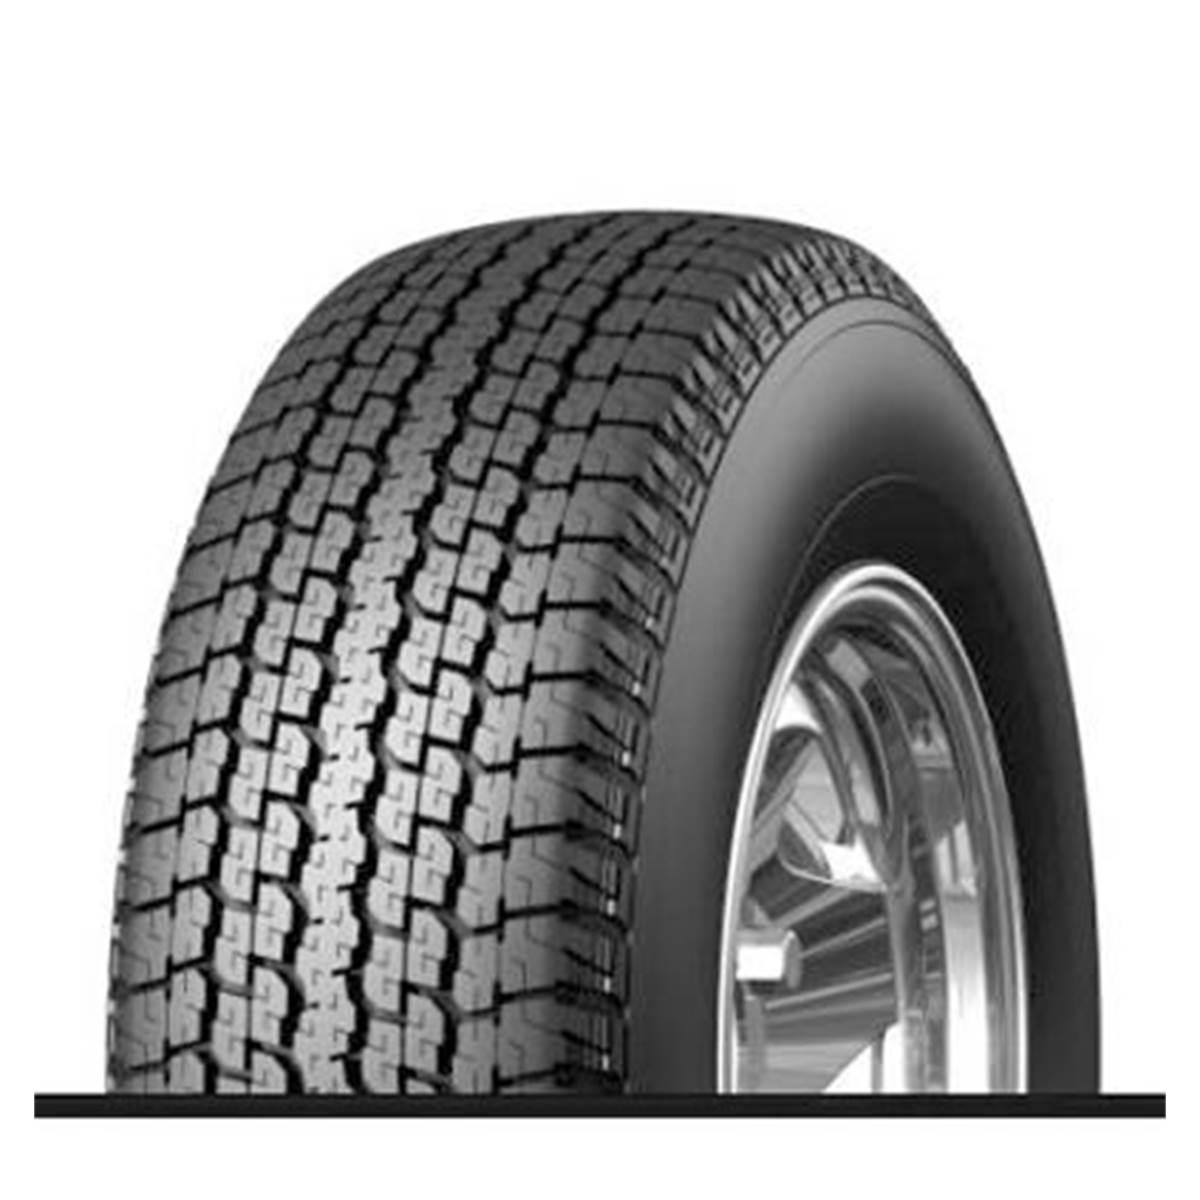 Pneu Bridgestone 205/82R16 110S DUELER D840